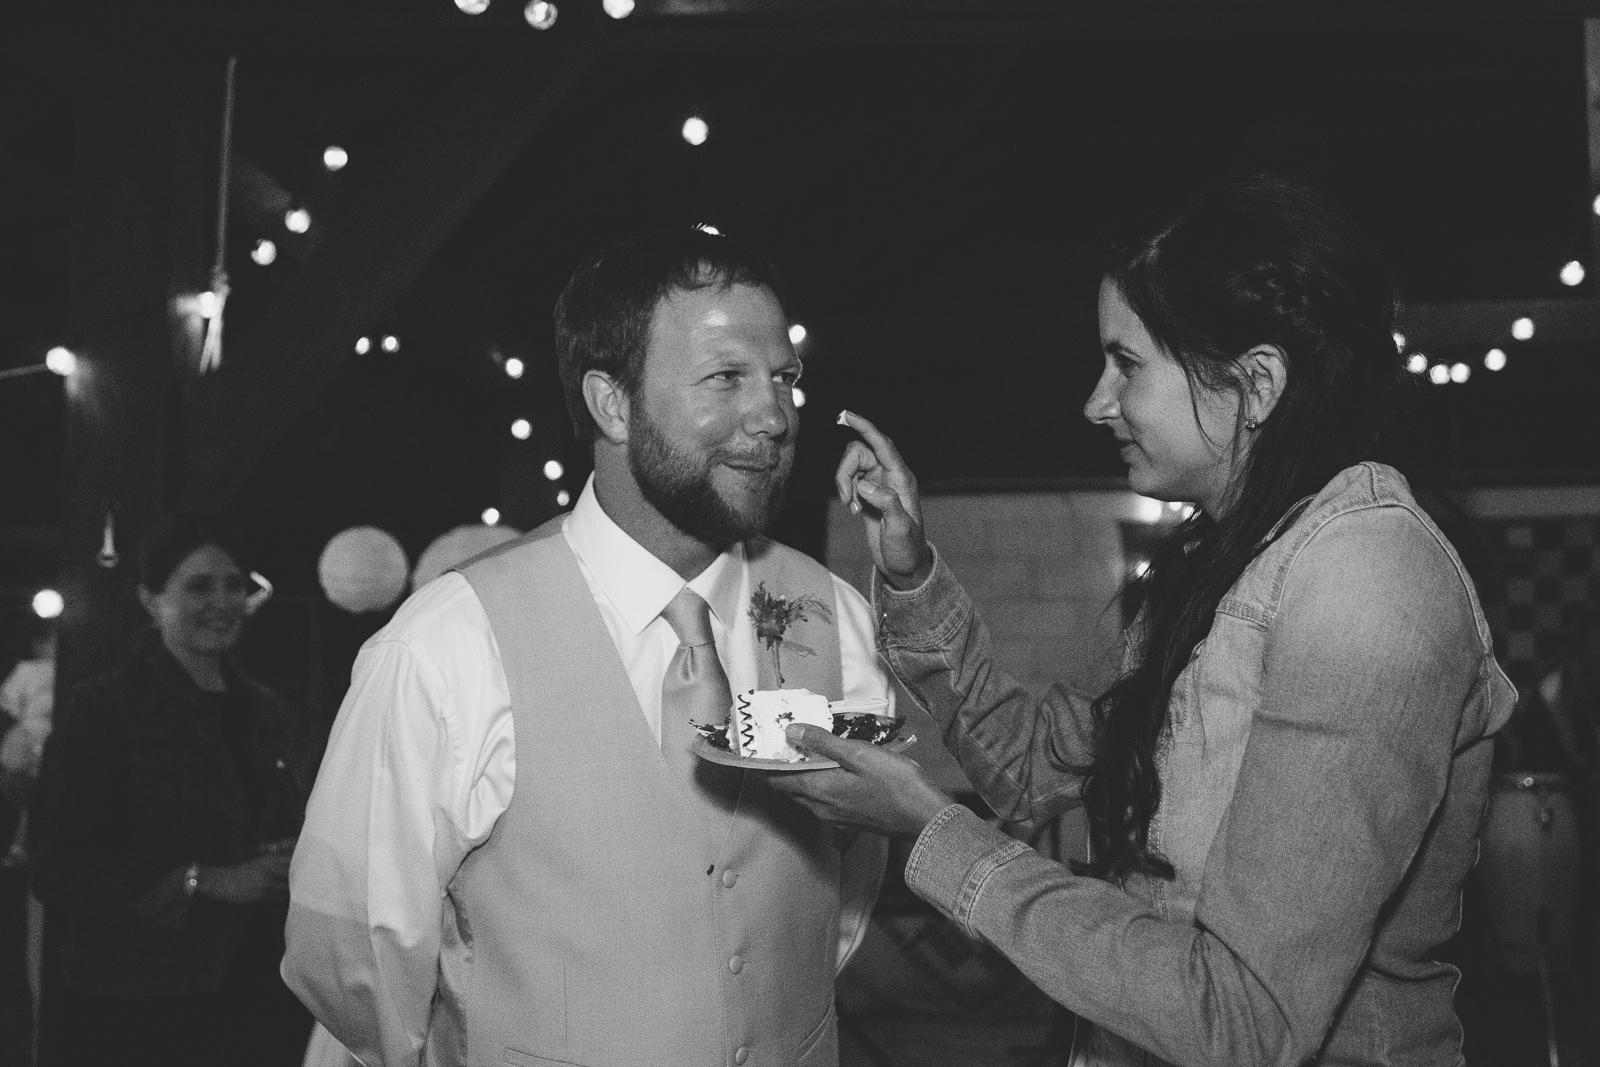 189-wedding-fun-photography-reception-unique-nature-trees-dancing